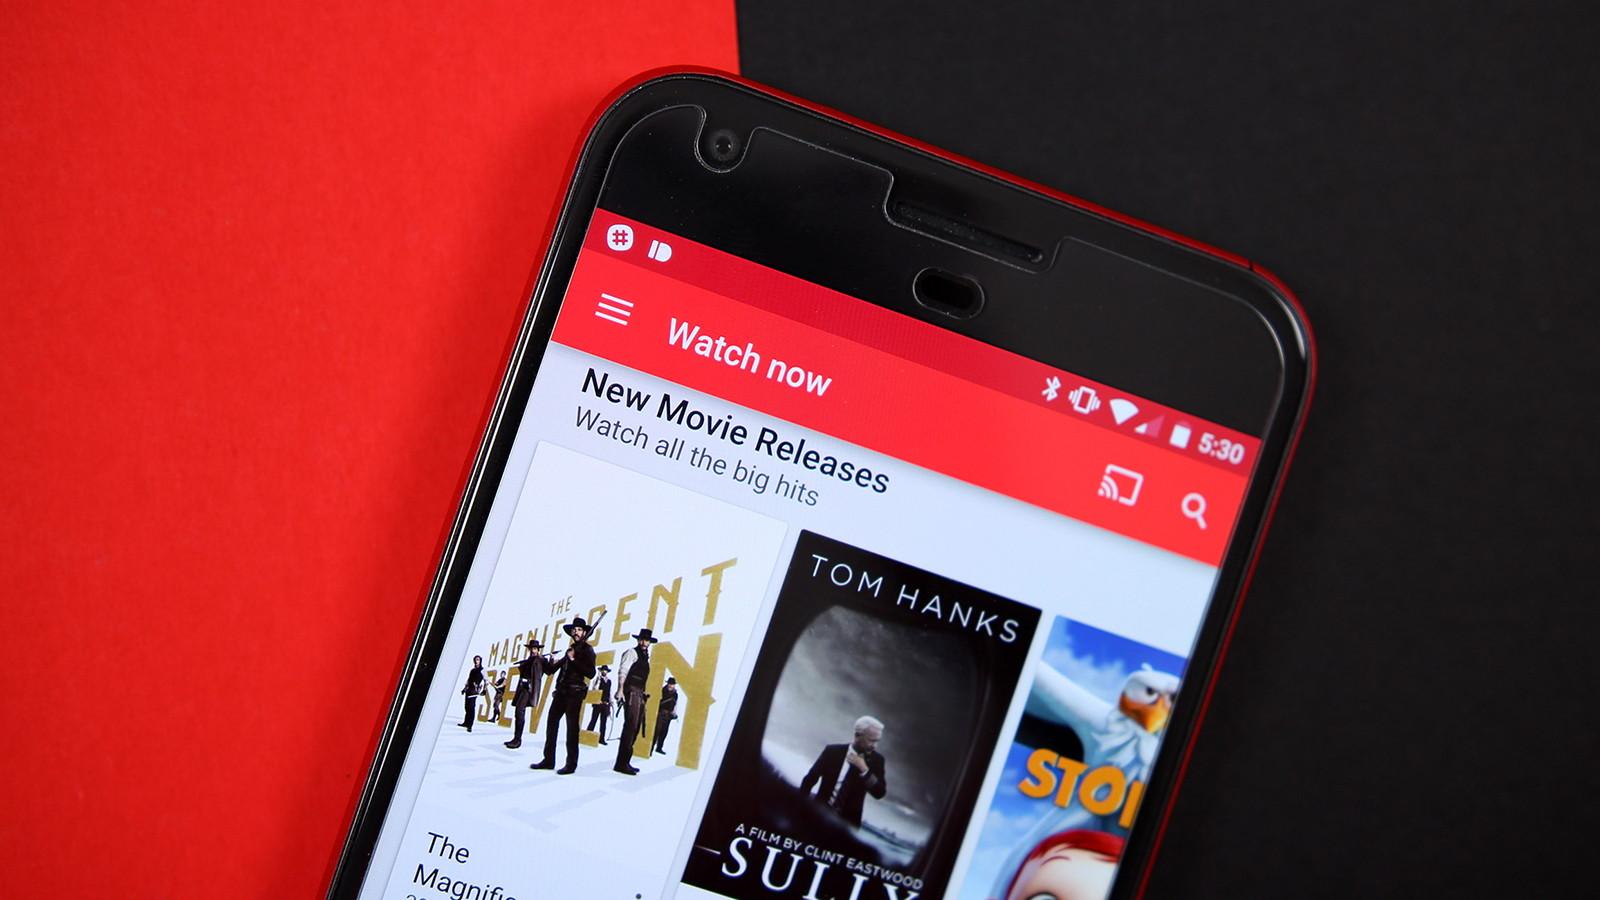 Top 10 Best Free Movie Streaming Apps in 2019 | TechNadu